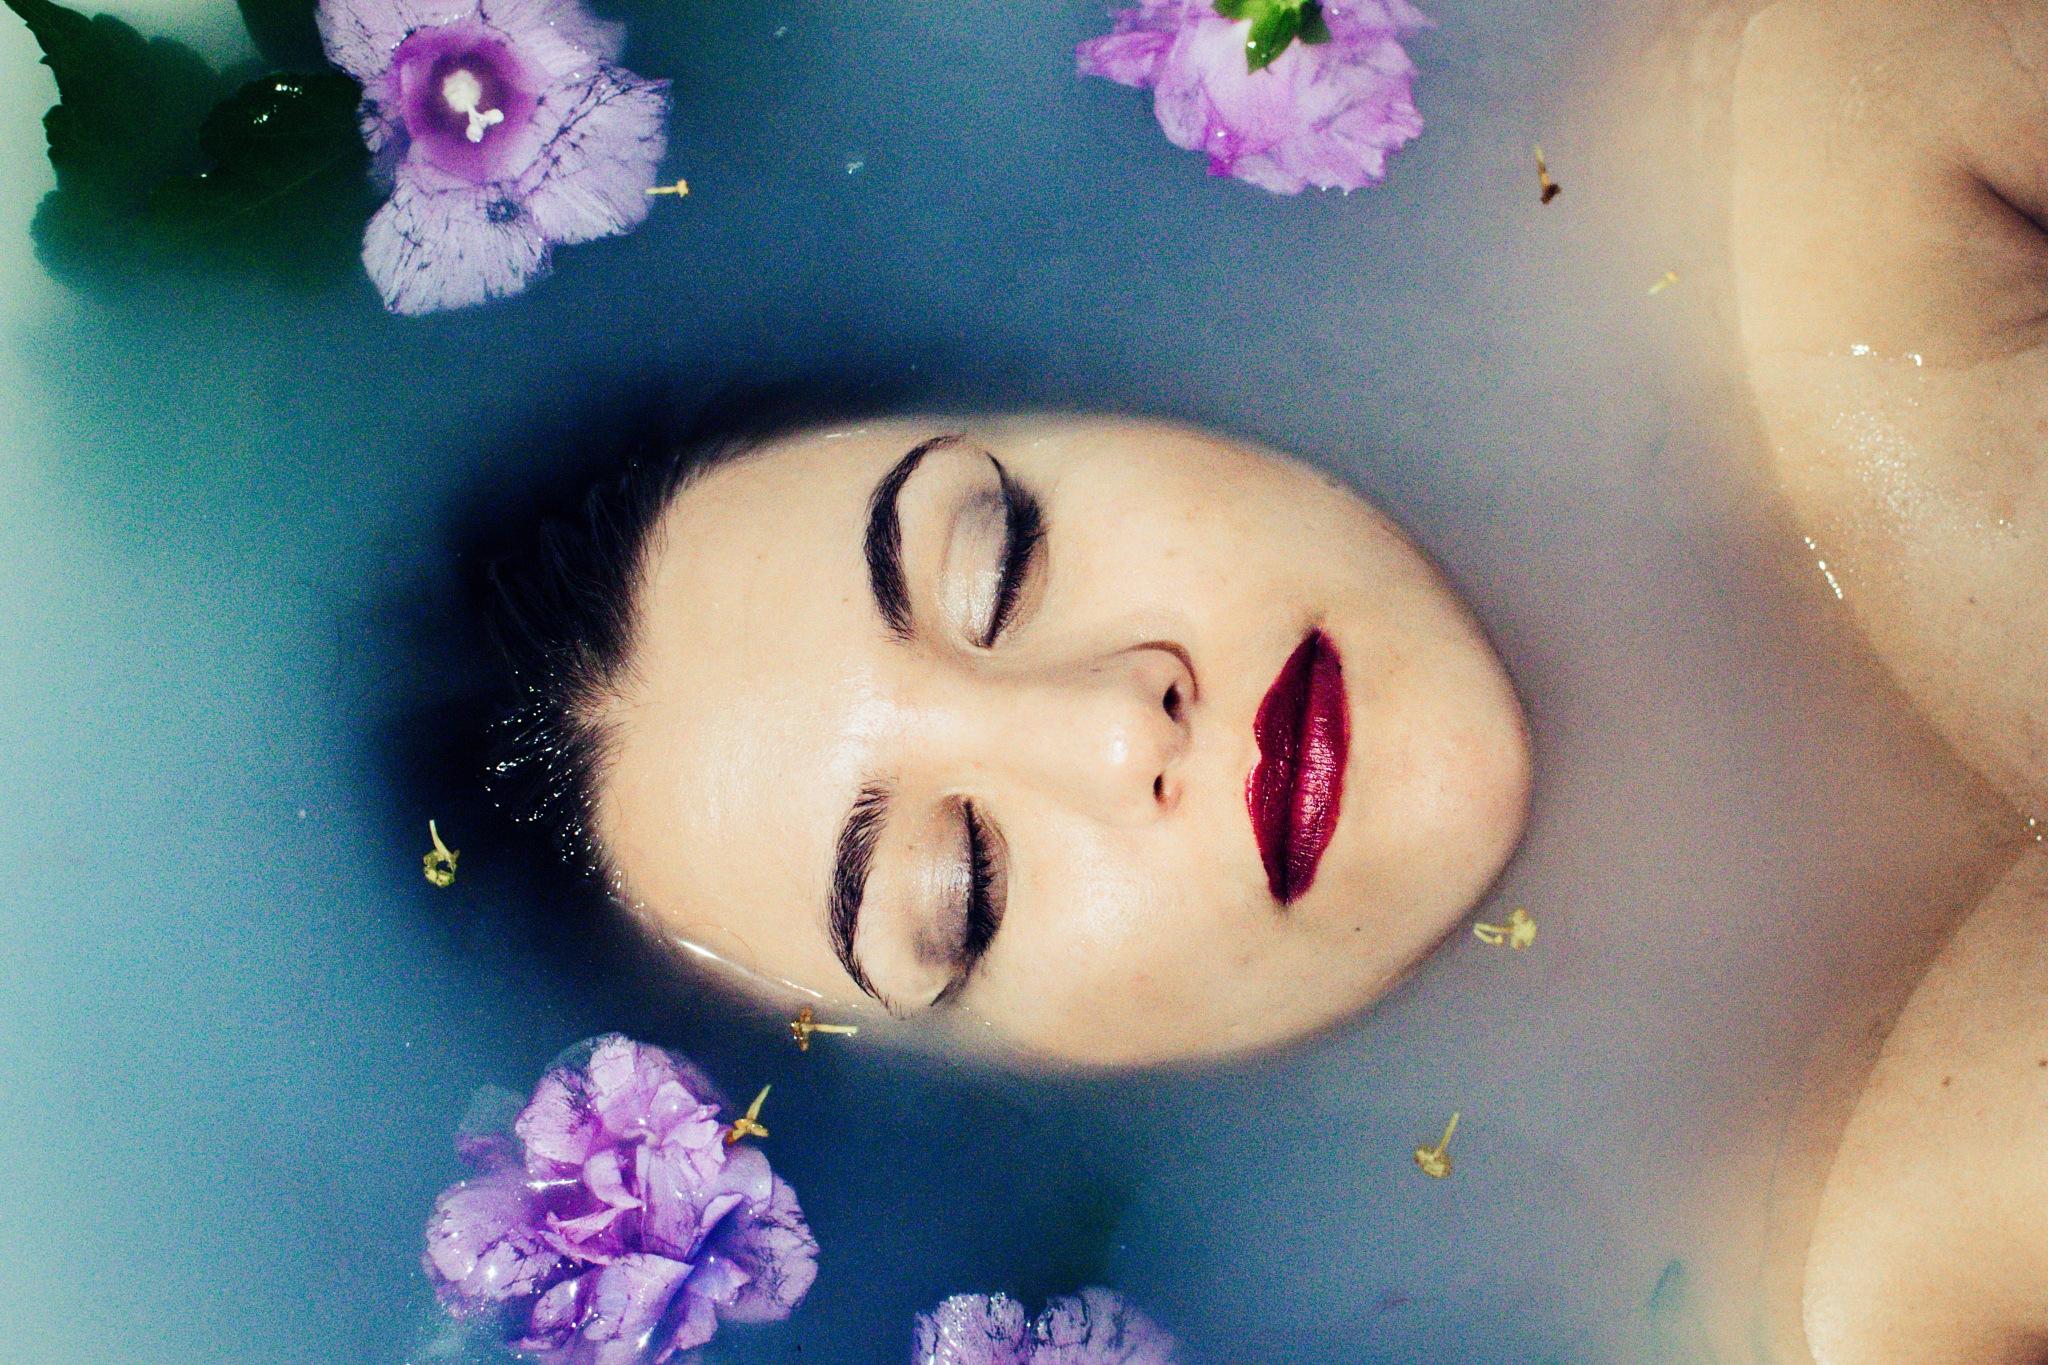 Another Milk & Flowers Bath Portrait by Christy Kourkloglou